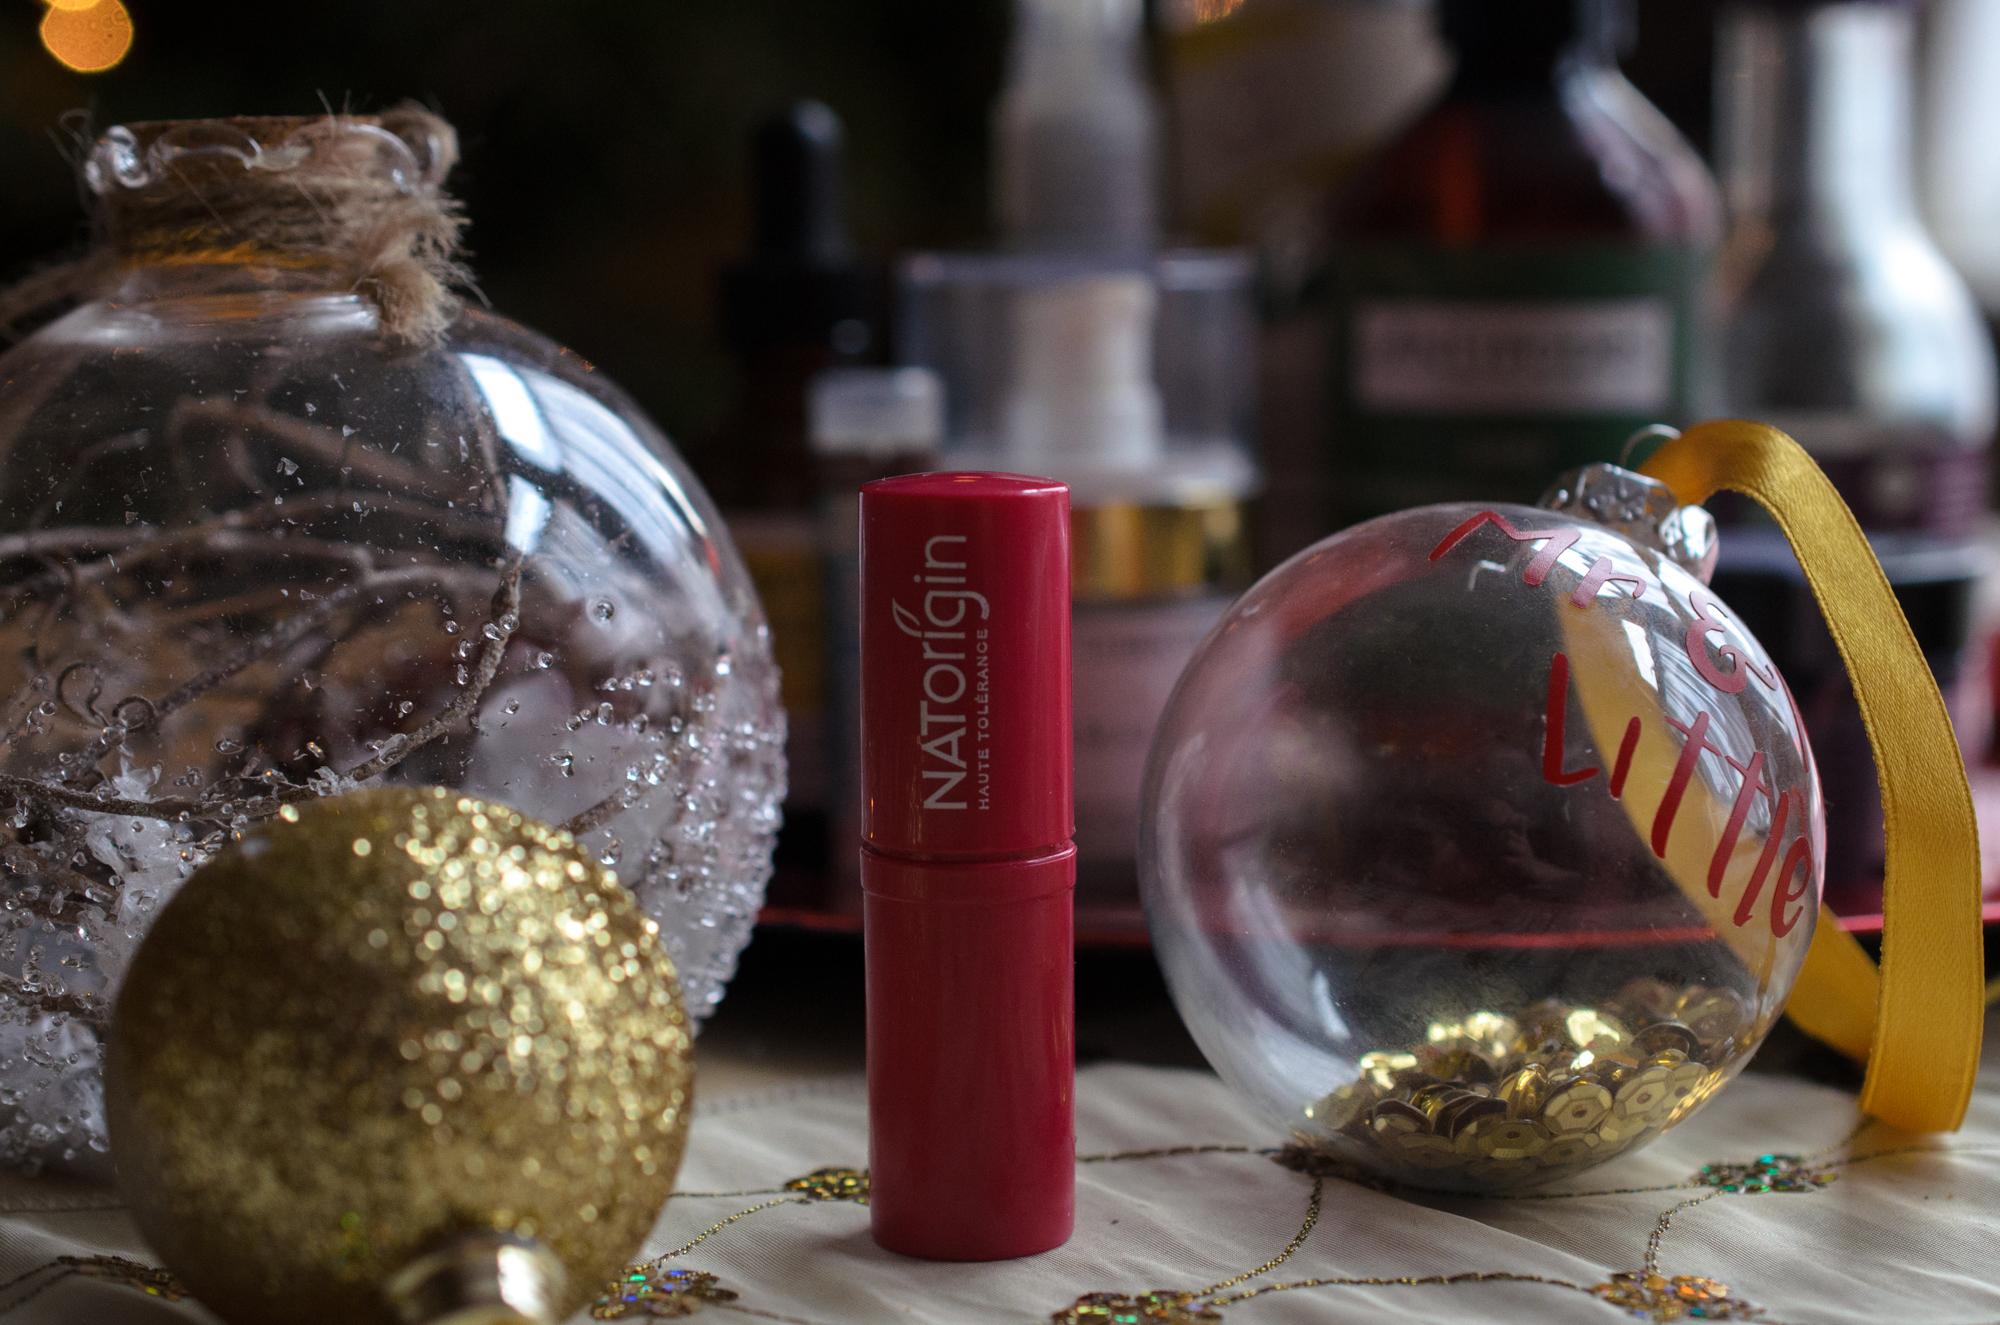 NATorigin Lipstick